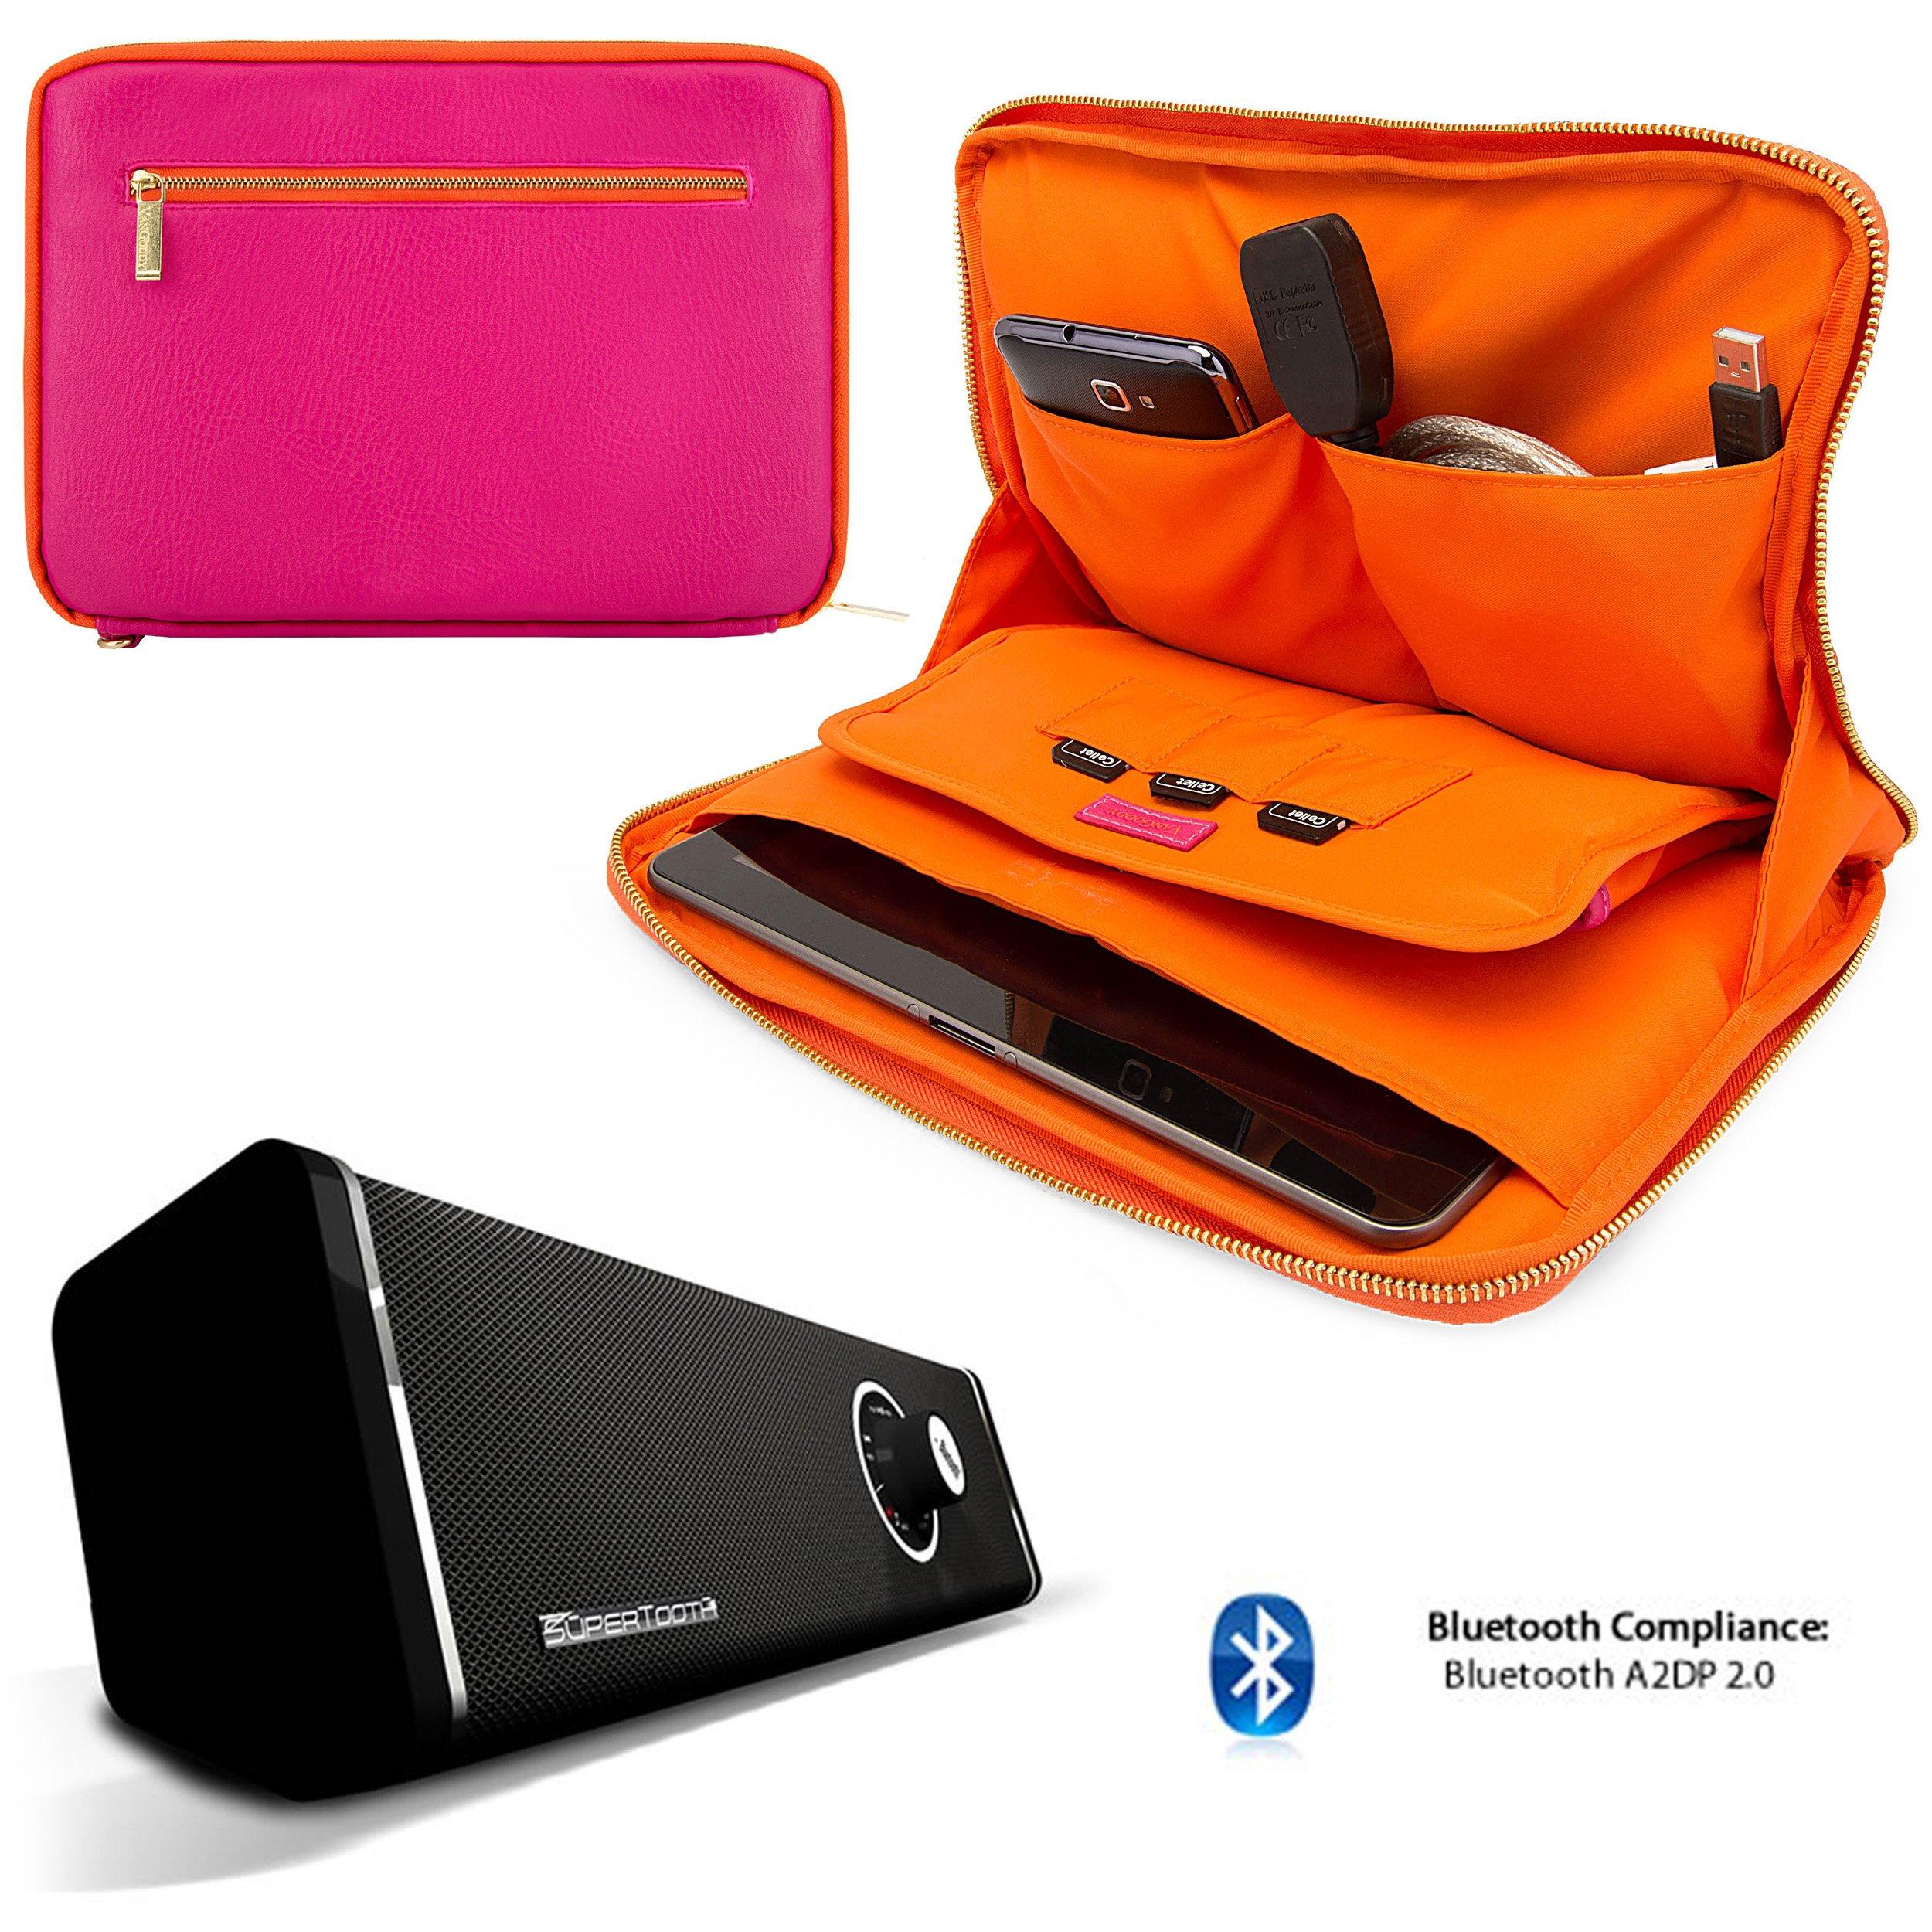 Travel Leatherette Sleeve For Samsung Galaxy Tab S 10.5 / Galaxy Tab 4 10.1 / Galaxy Tab Pro 10.1 + Bluetooth Speaker by VangoddyCase (Image #1)